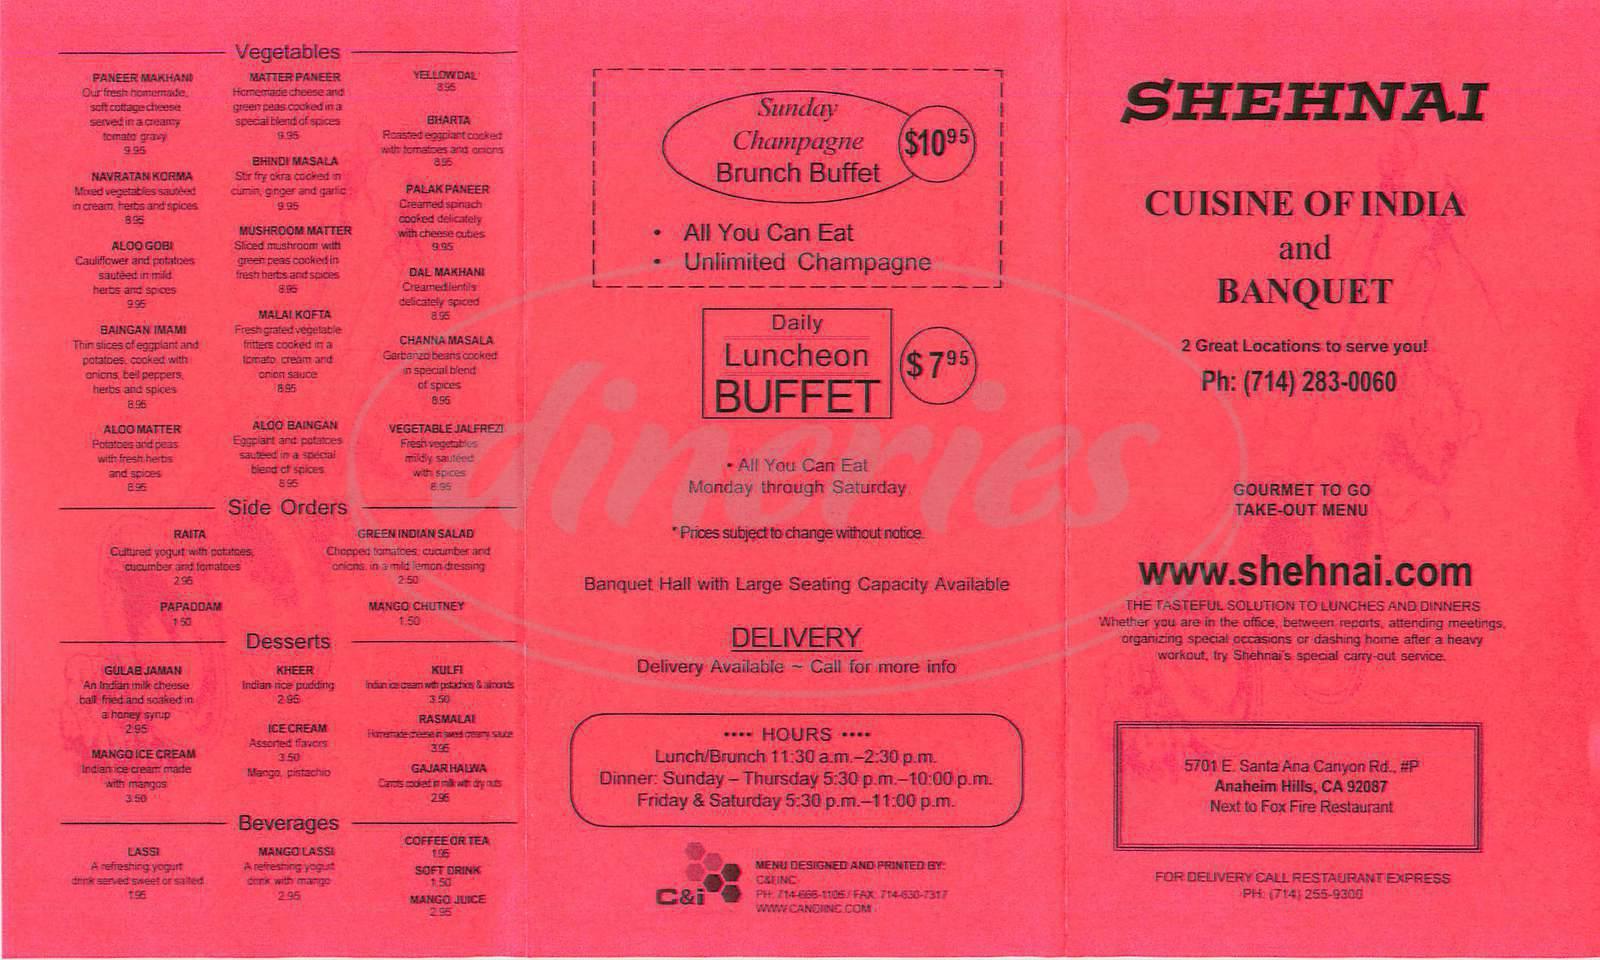 menu for Shehnai Cuisine of India